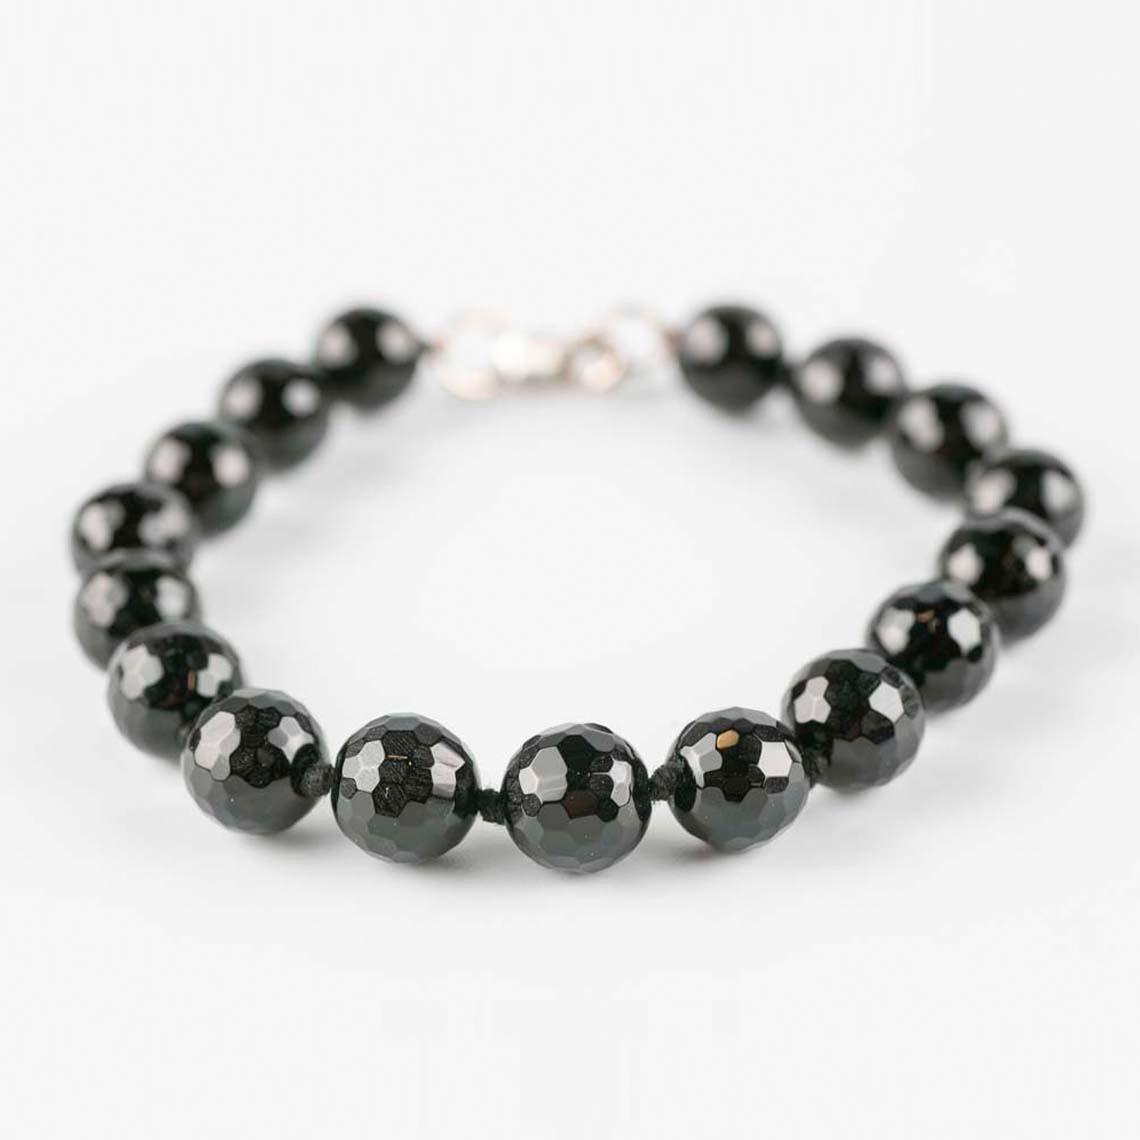 Oynx bracelet